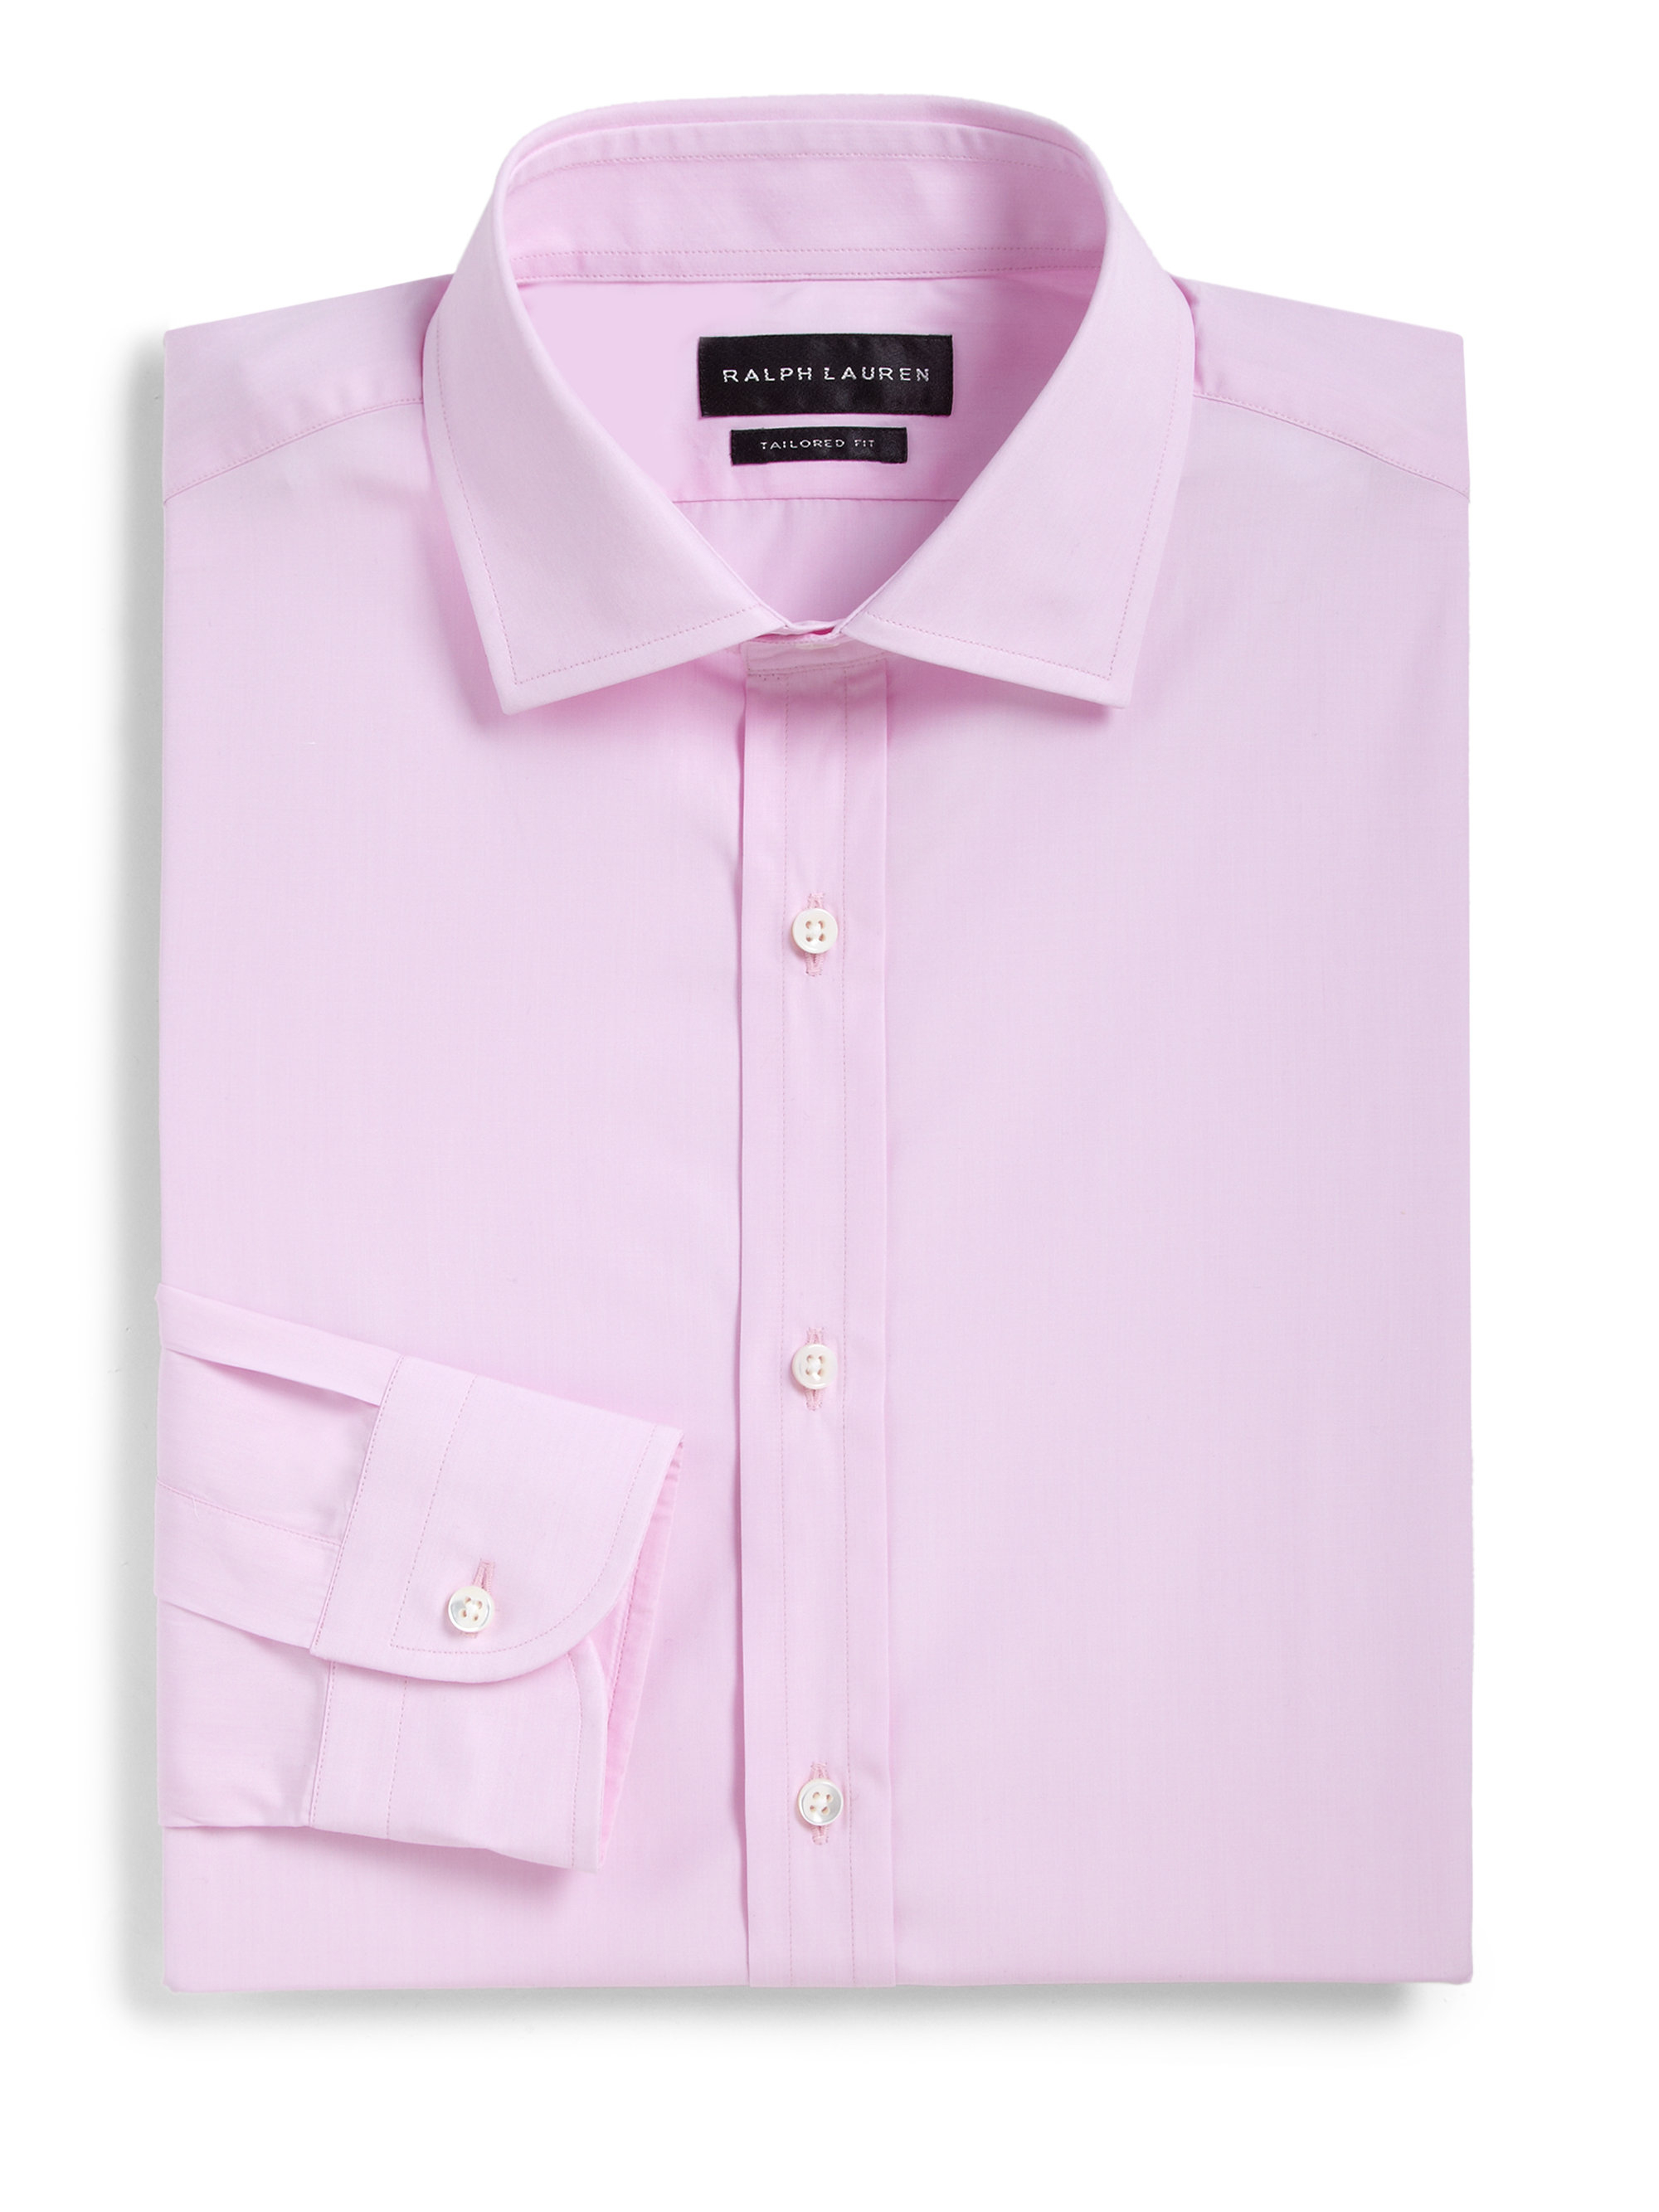 Ralph Lauren Black Label Tailored Fit Cotton Dress Shirt